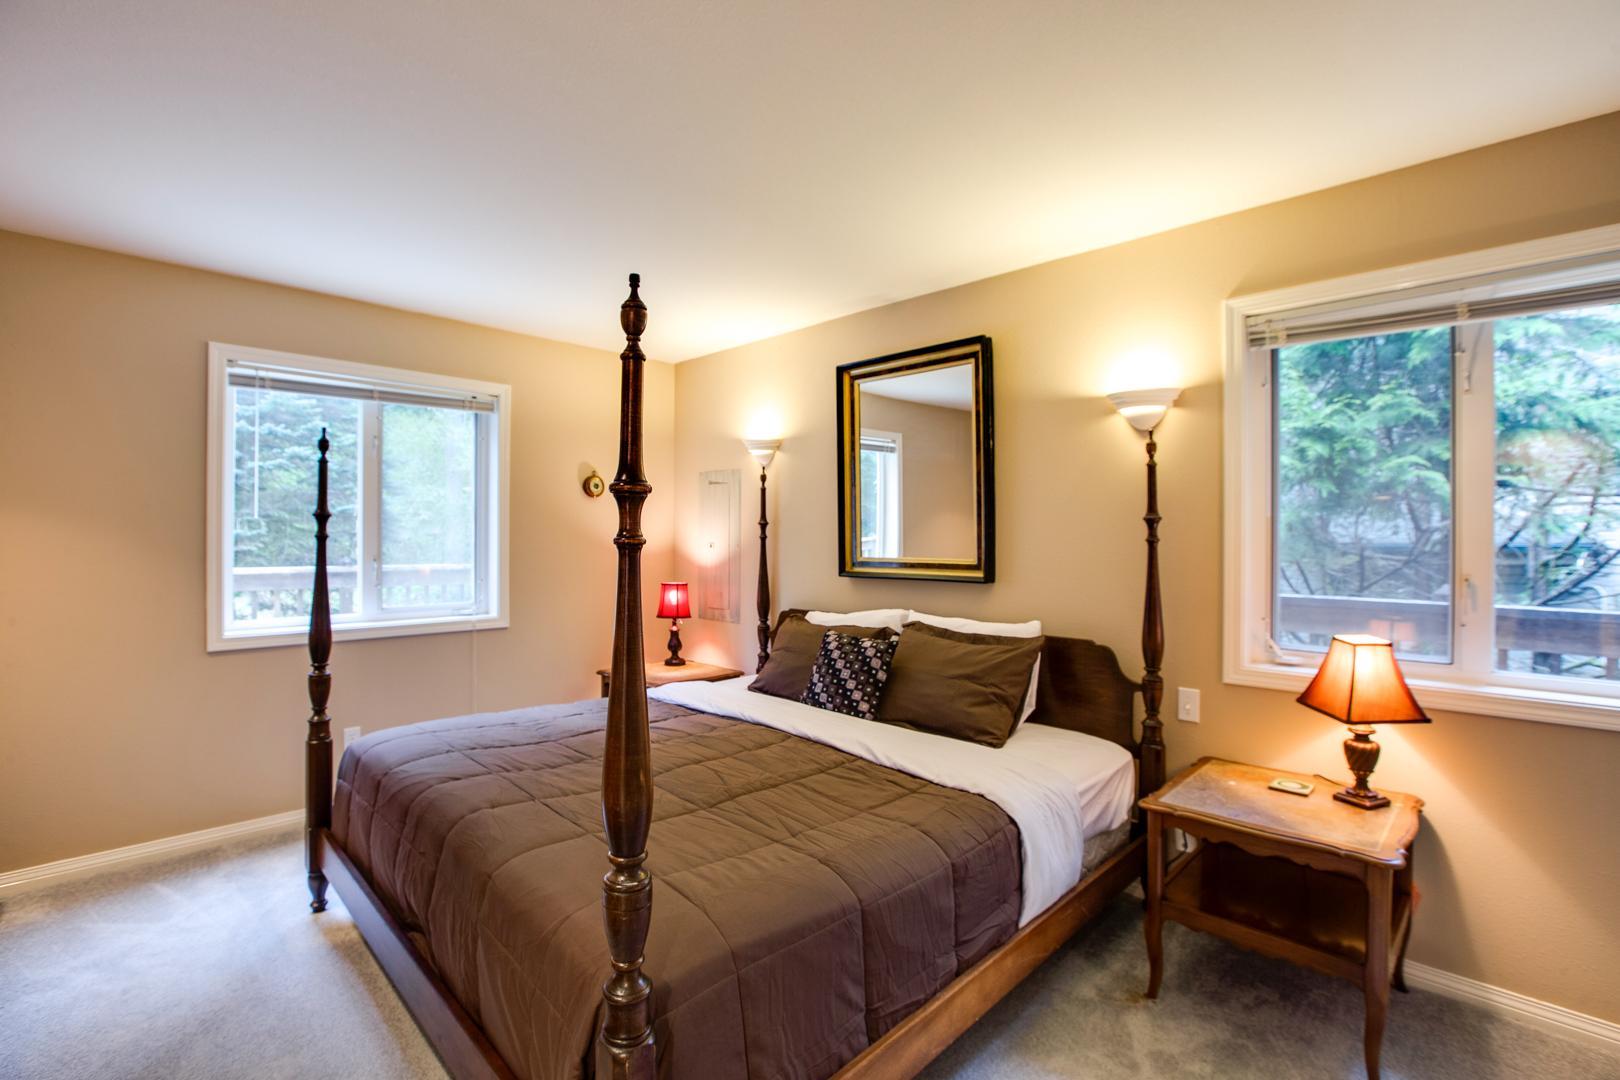 Apartment Mt  Baker Lodging Cabin  58     FIREPLACE  DISHWASHER  WIFI  SLEEPS 6  photo 4276965